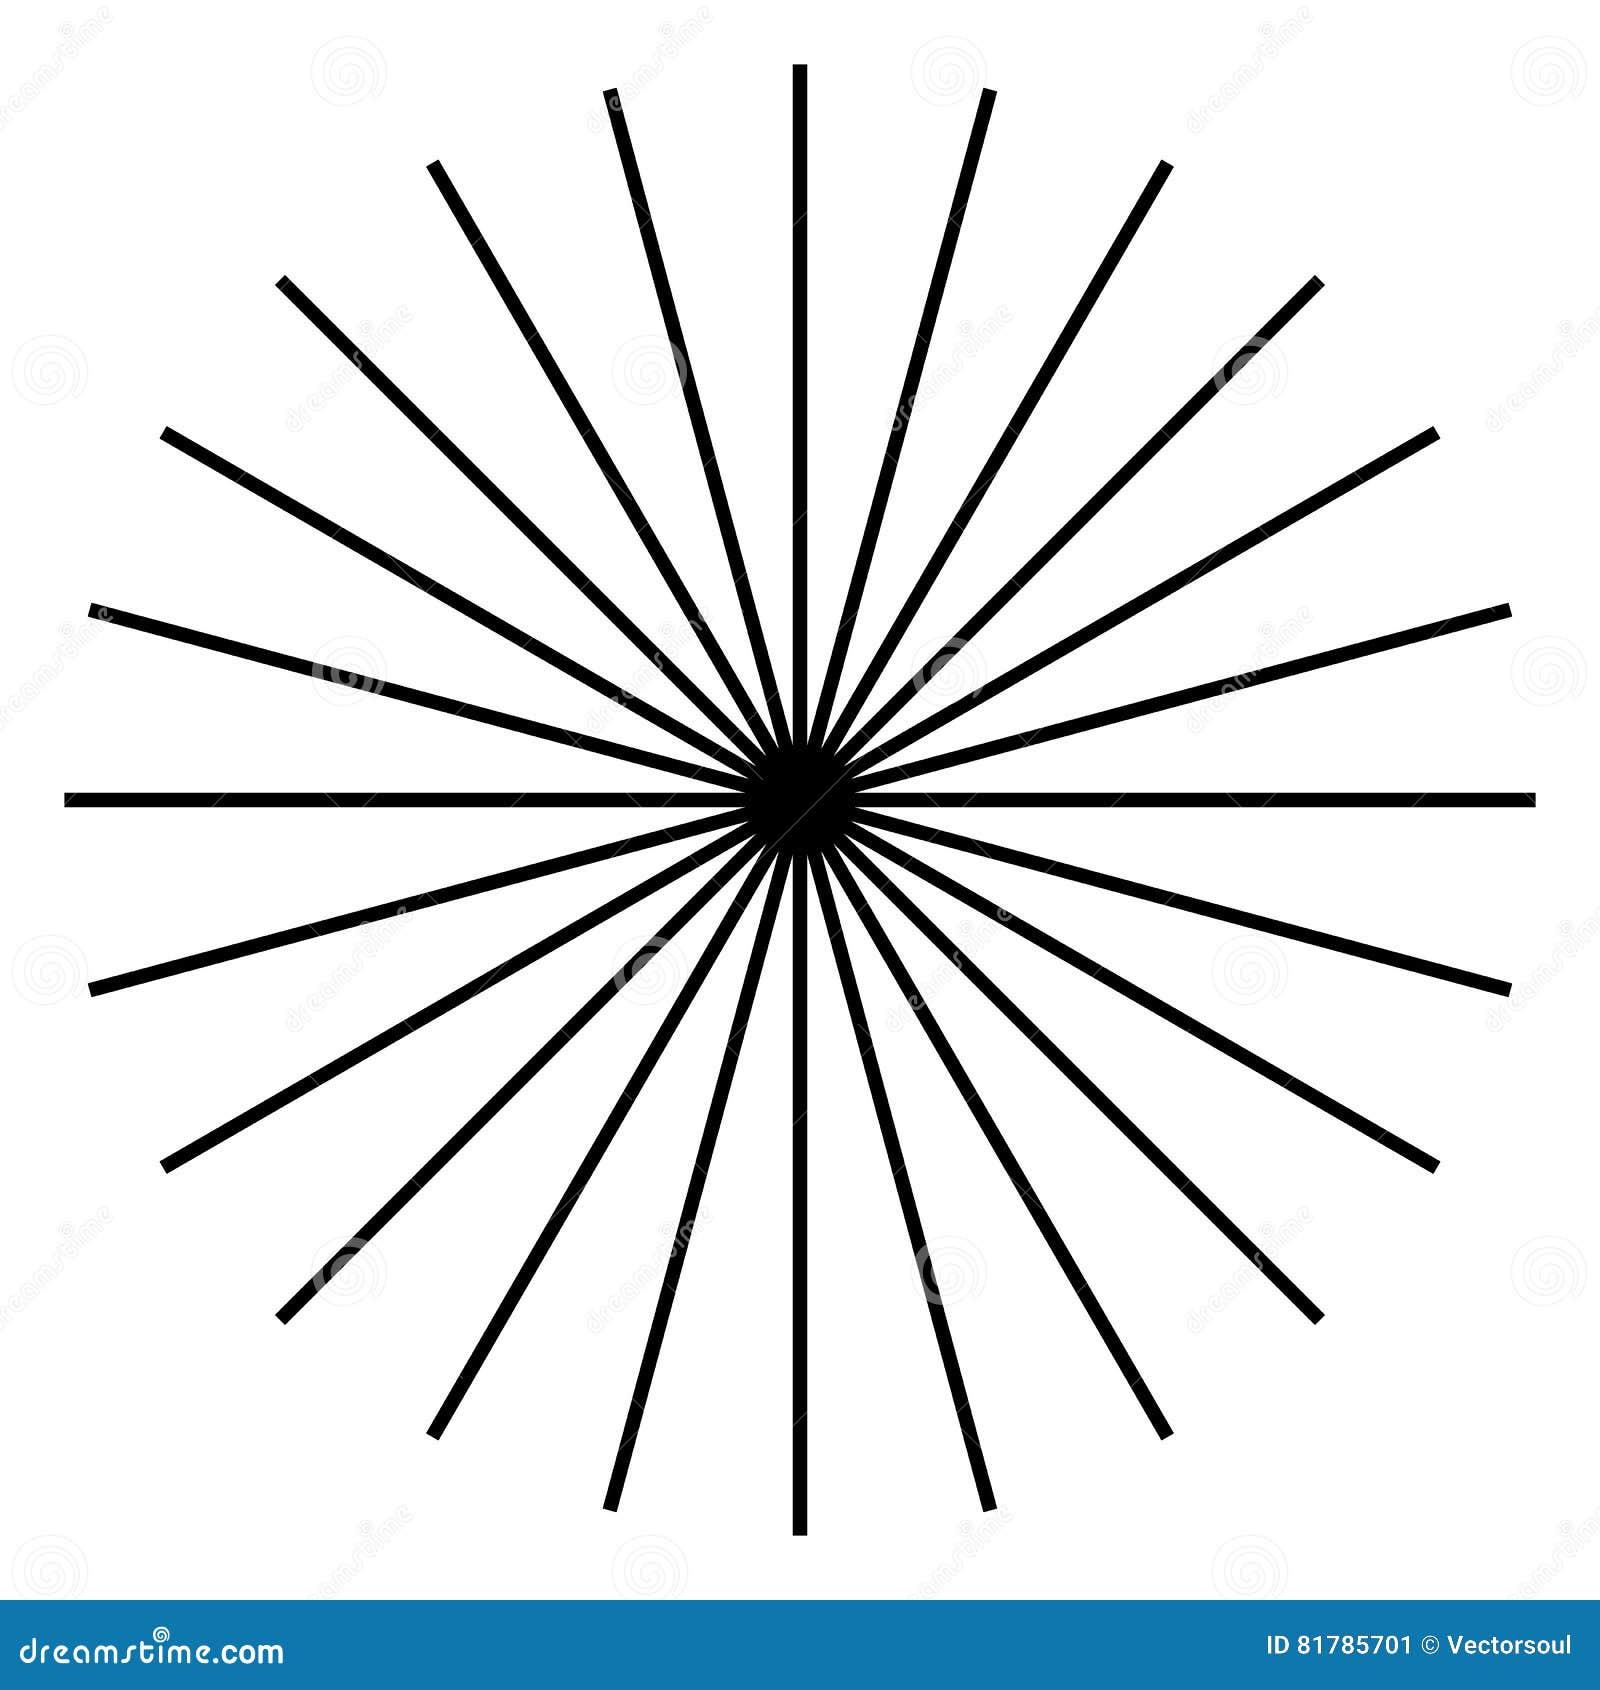 Irradiando, líneas radiales Starburst, forma del resplandor solar Ray, li del haz